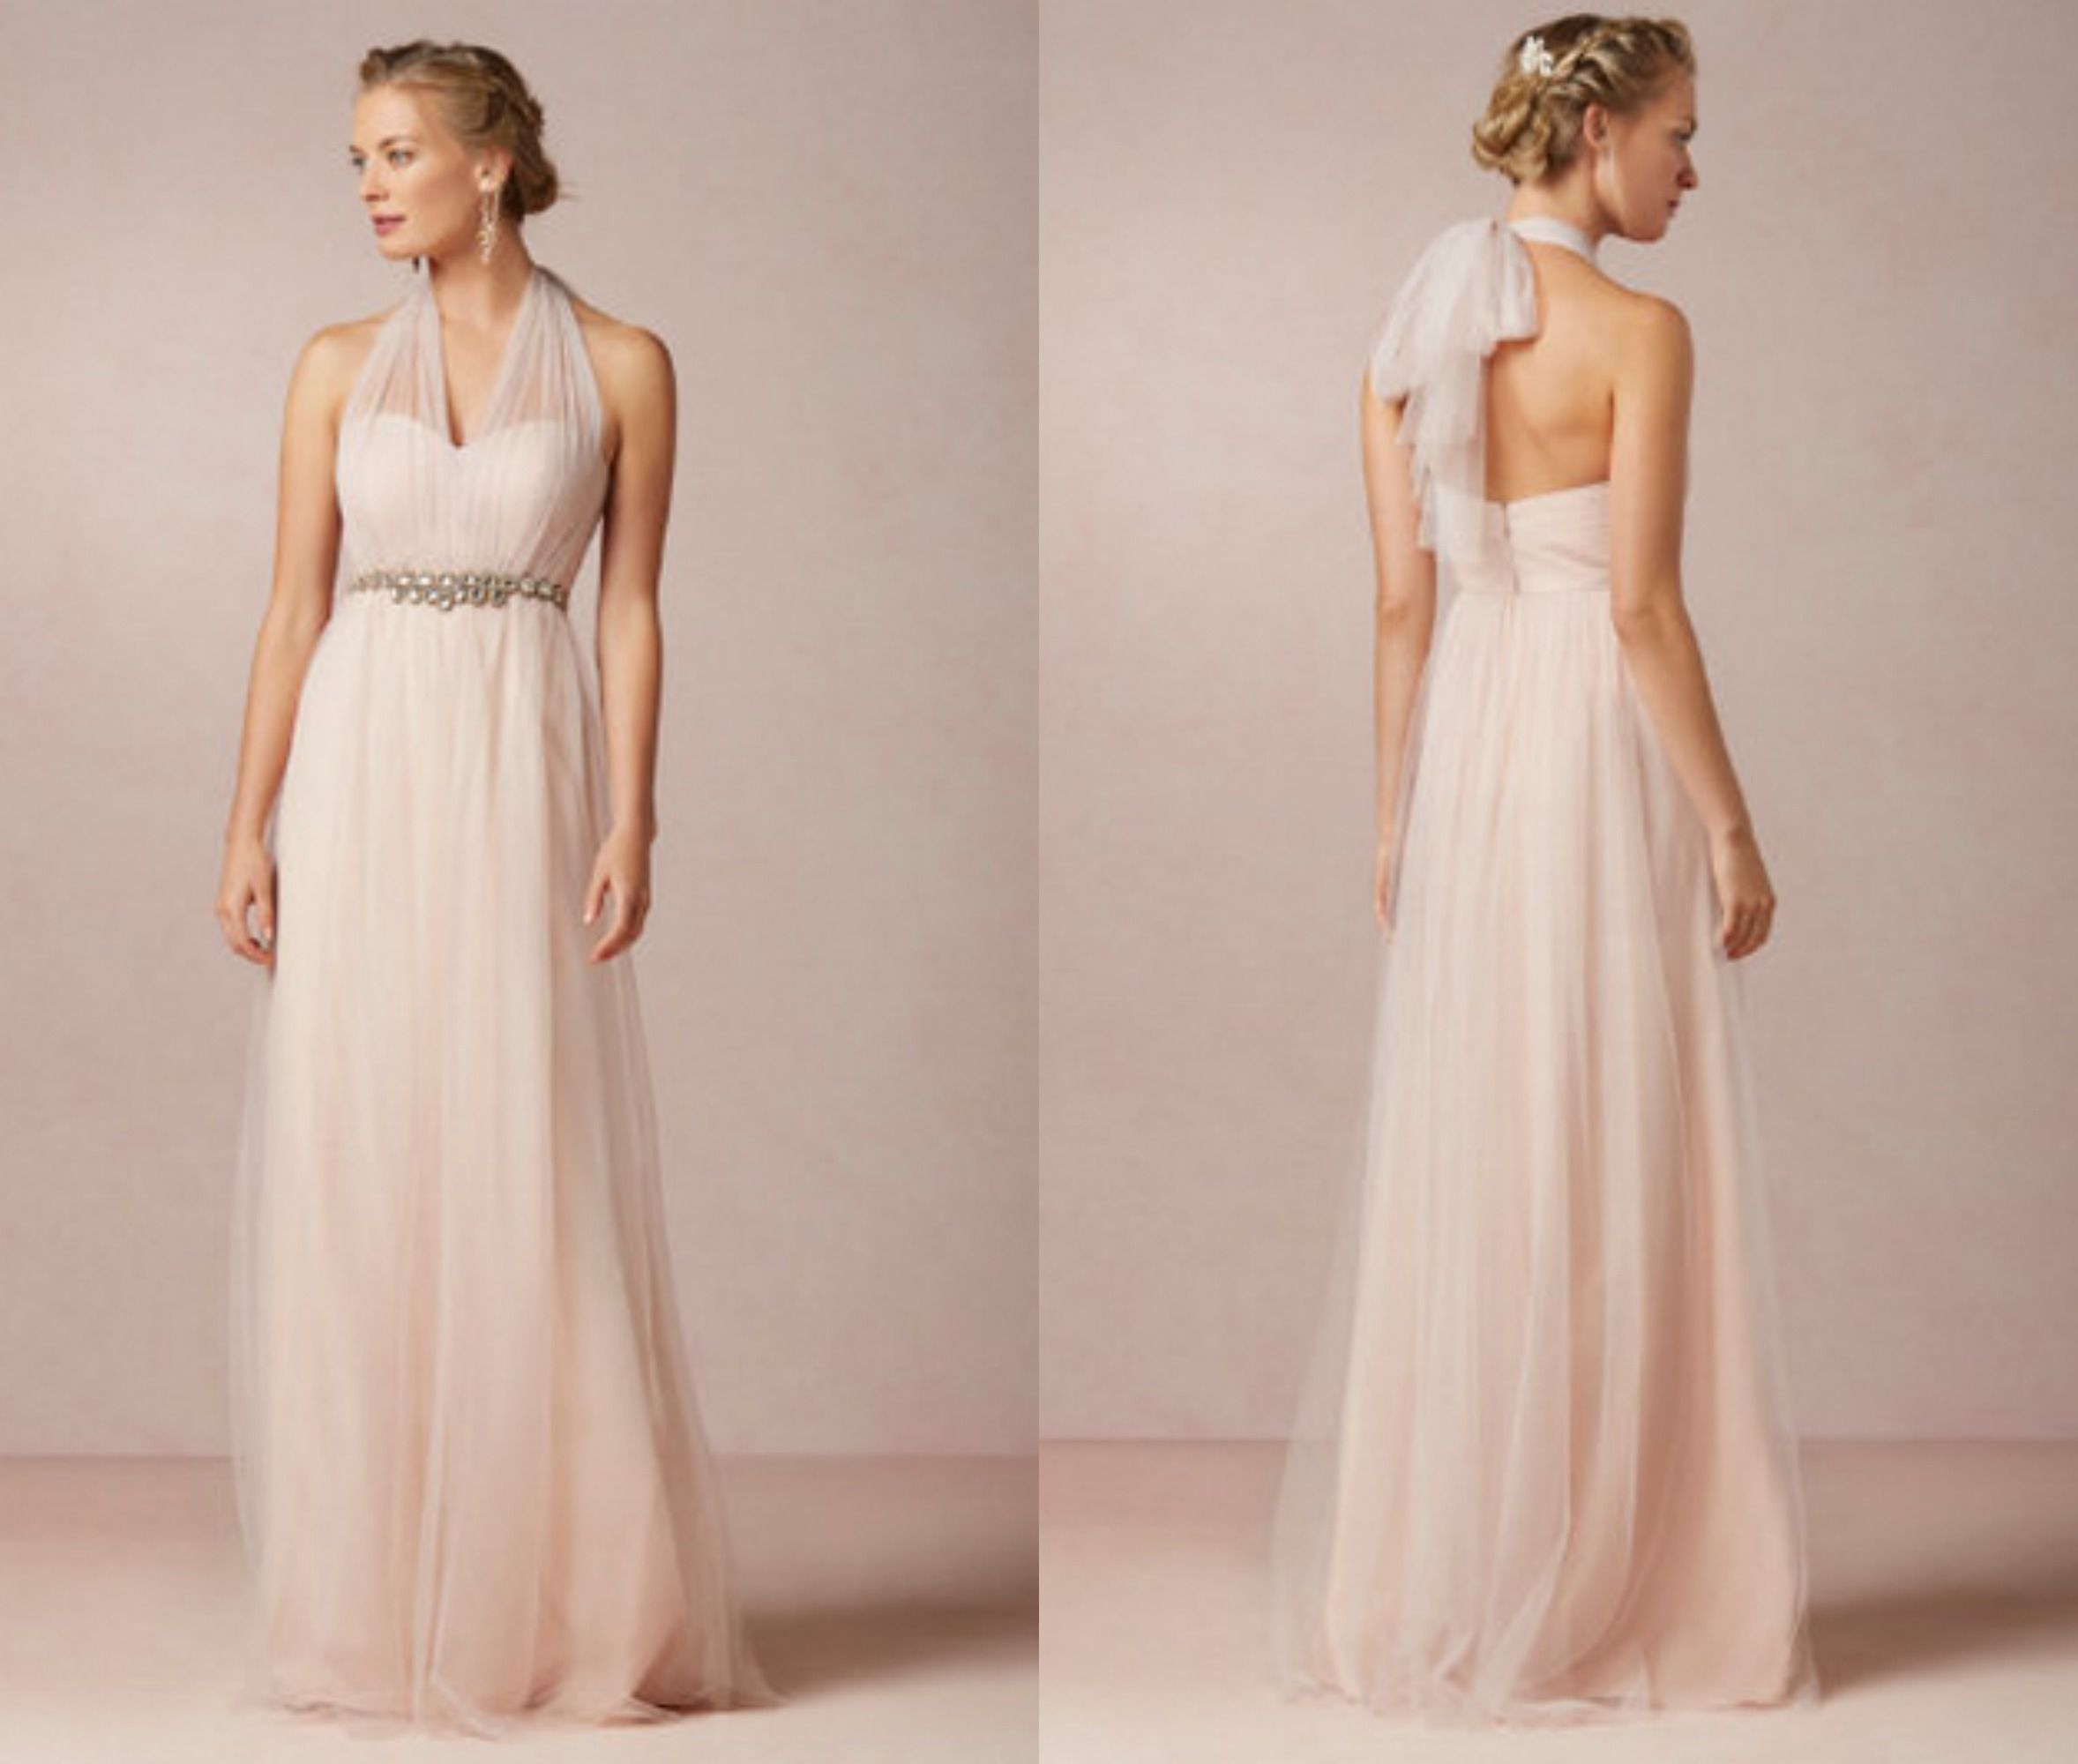 light wedding one pin evening shoulder hollow bridesmaid neck chiffon lighting blue dress dresses long